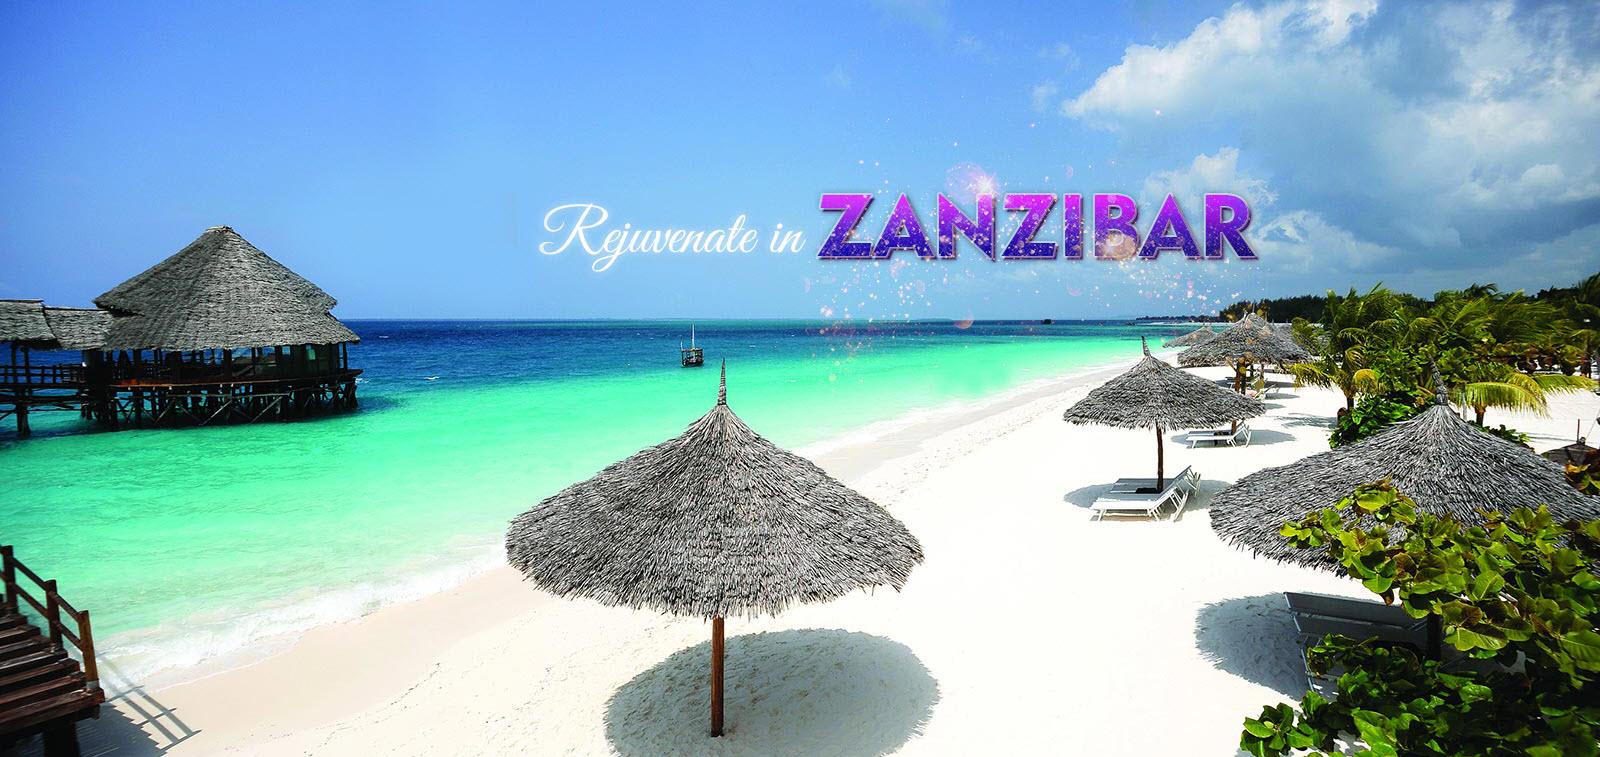 What do you need to travel to Zanzibar? – How to travel